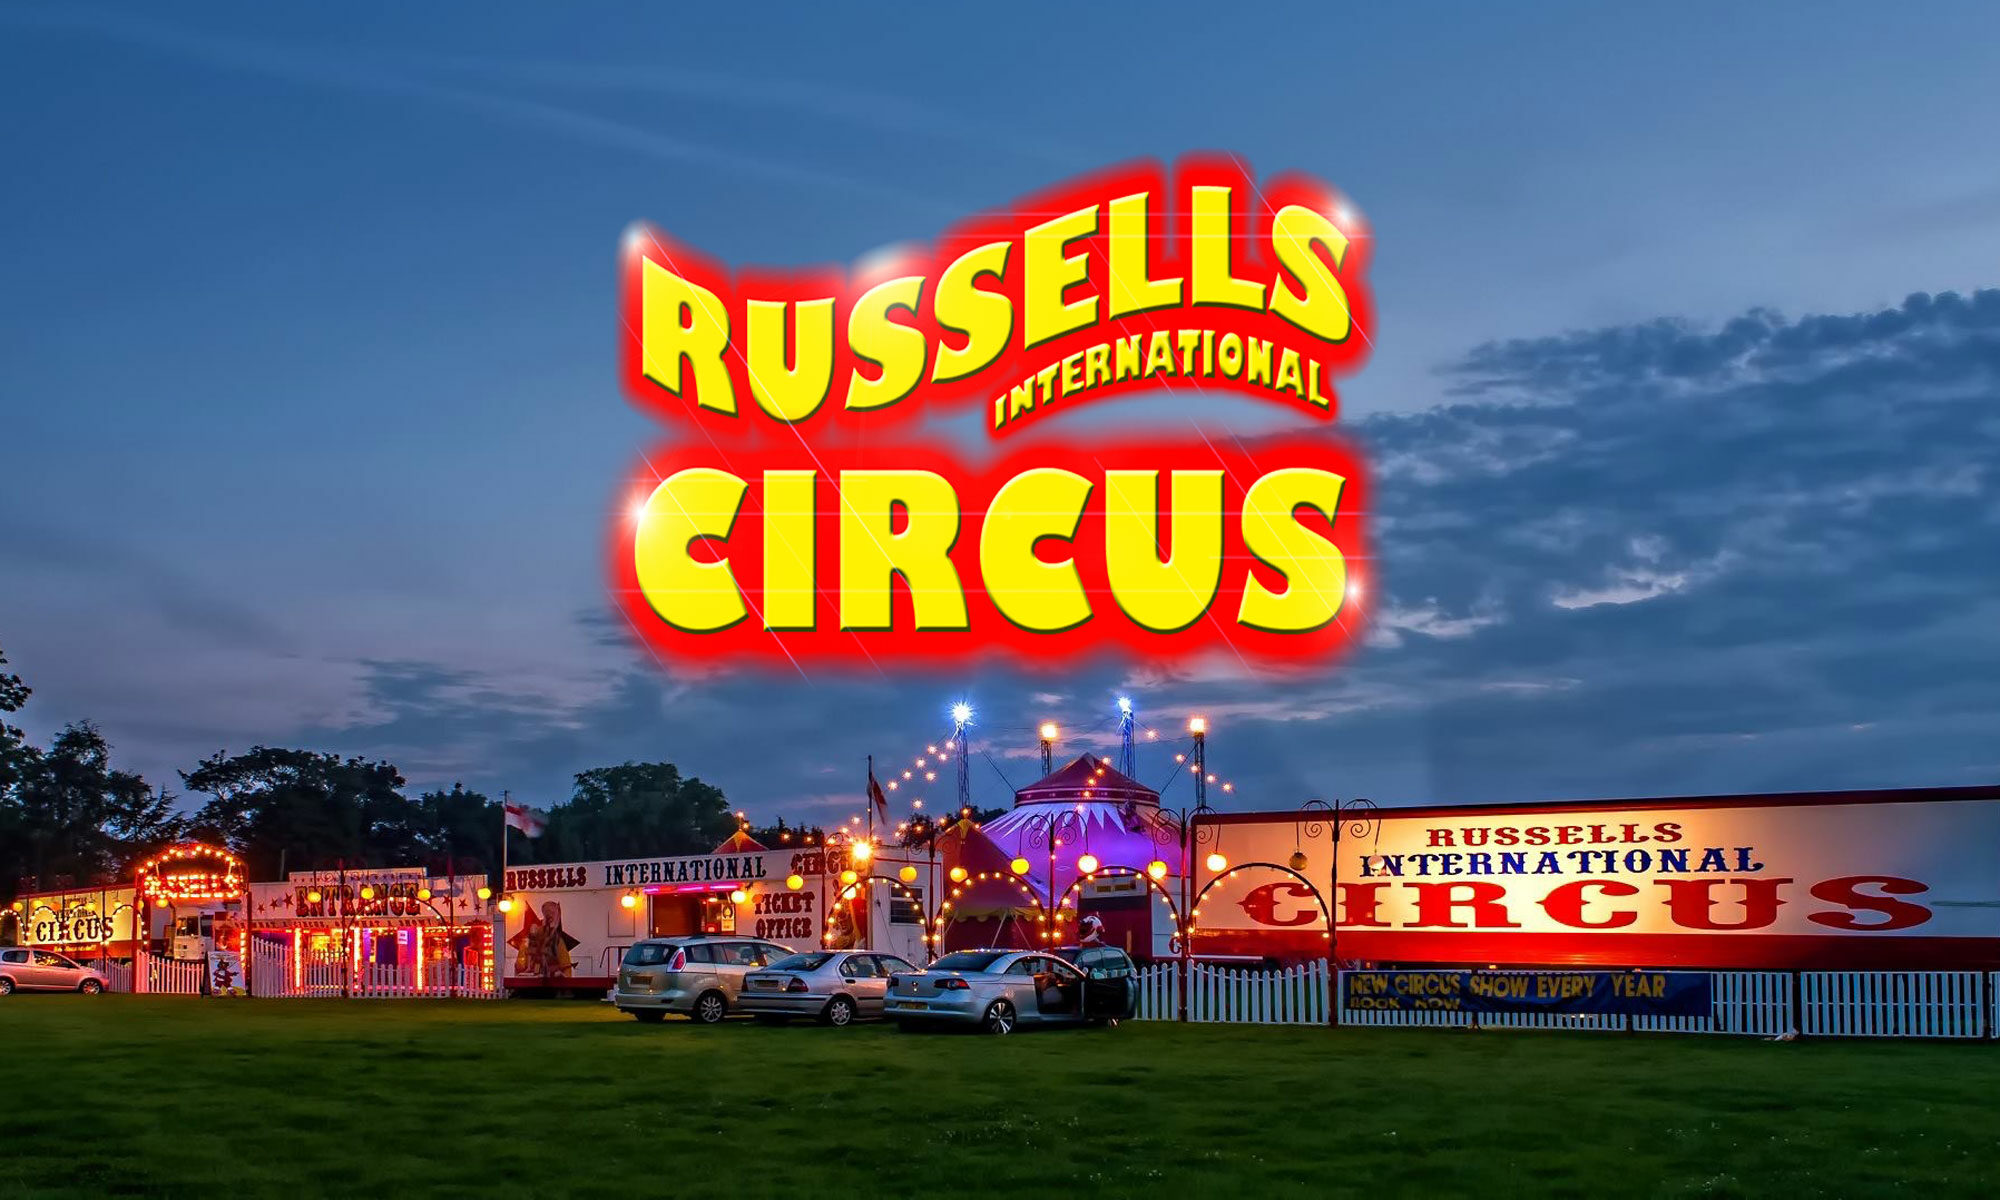 Russell's International Circus